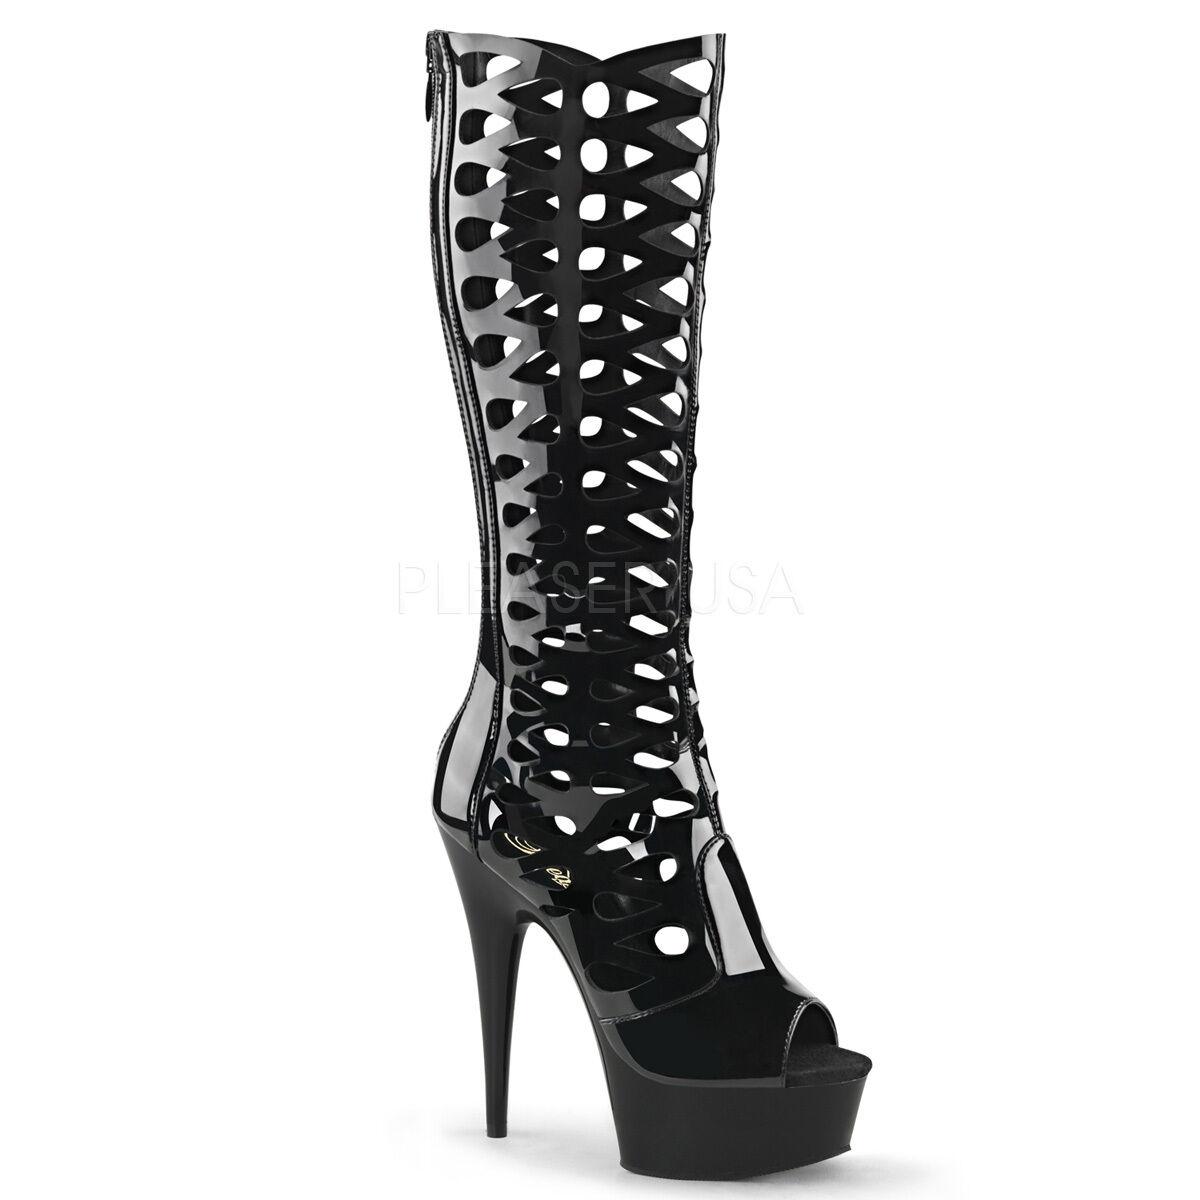 PLEASER - Delight-600-42 Stunning Stiletto Stiefel Heel Peep-Toe Knee High Stiefel Stiletto 683d88